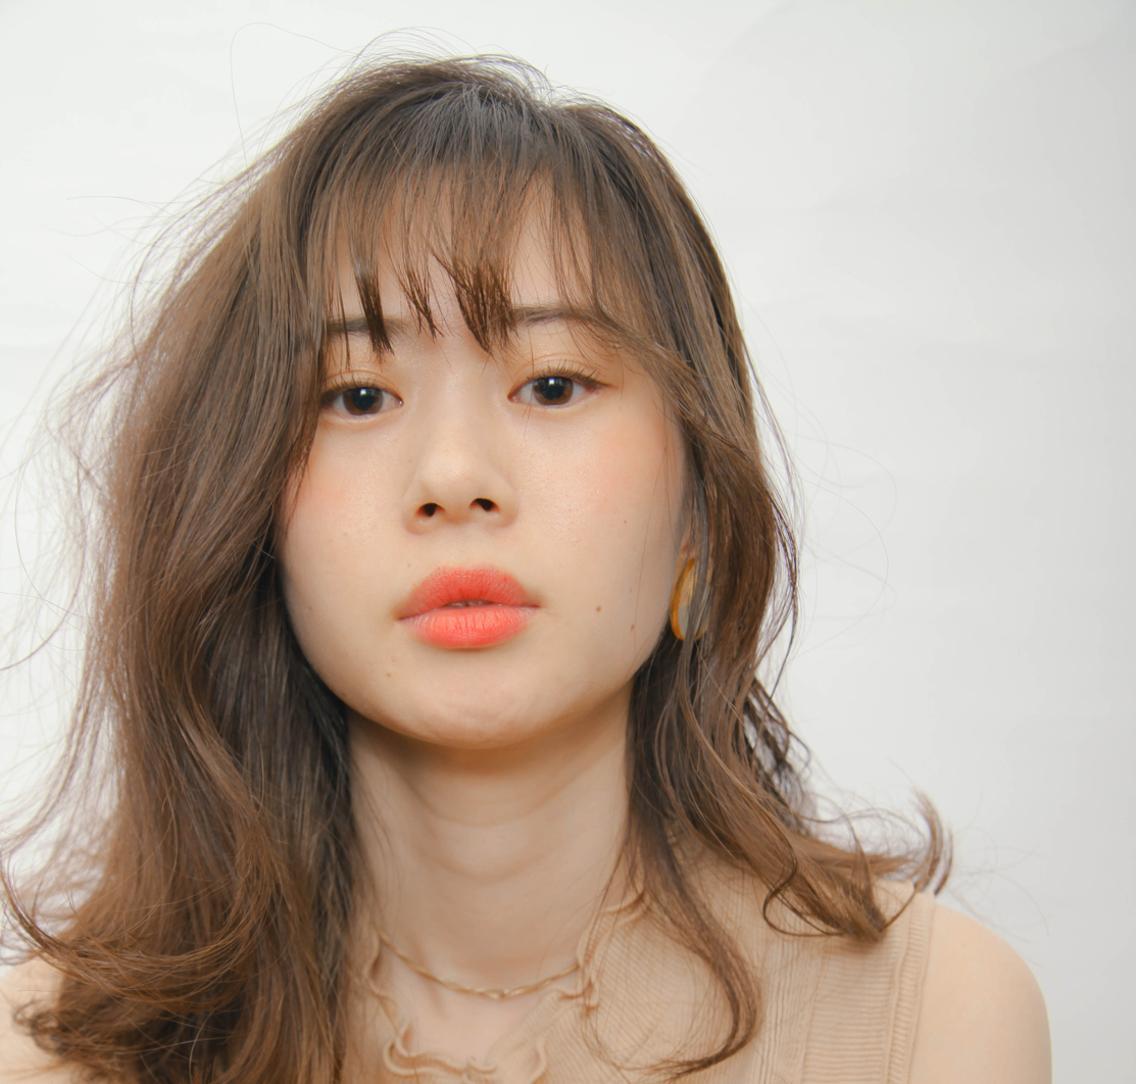 【minino限定クーポン⭐️リピート多数❗️当日予約OK❤️】阪急茶屋町出口すぐカラーモデル大募集中です❗️透明感、ツヤ、くすみカラー似合わせ得意です‼️是非一度ご予約してみてください✨